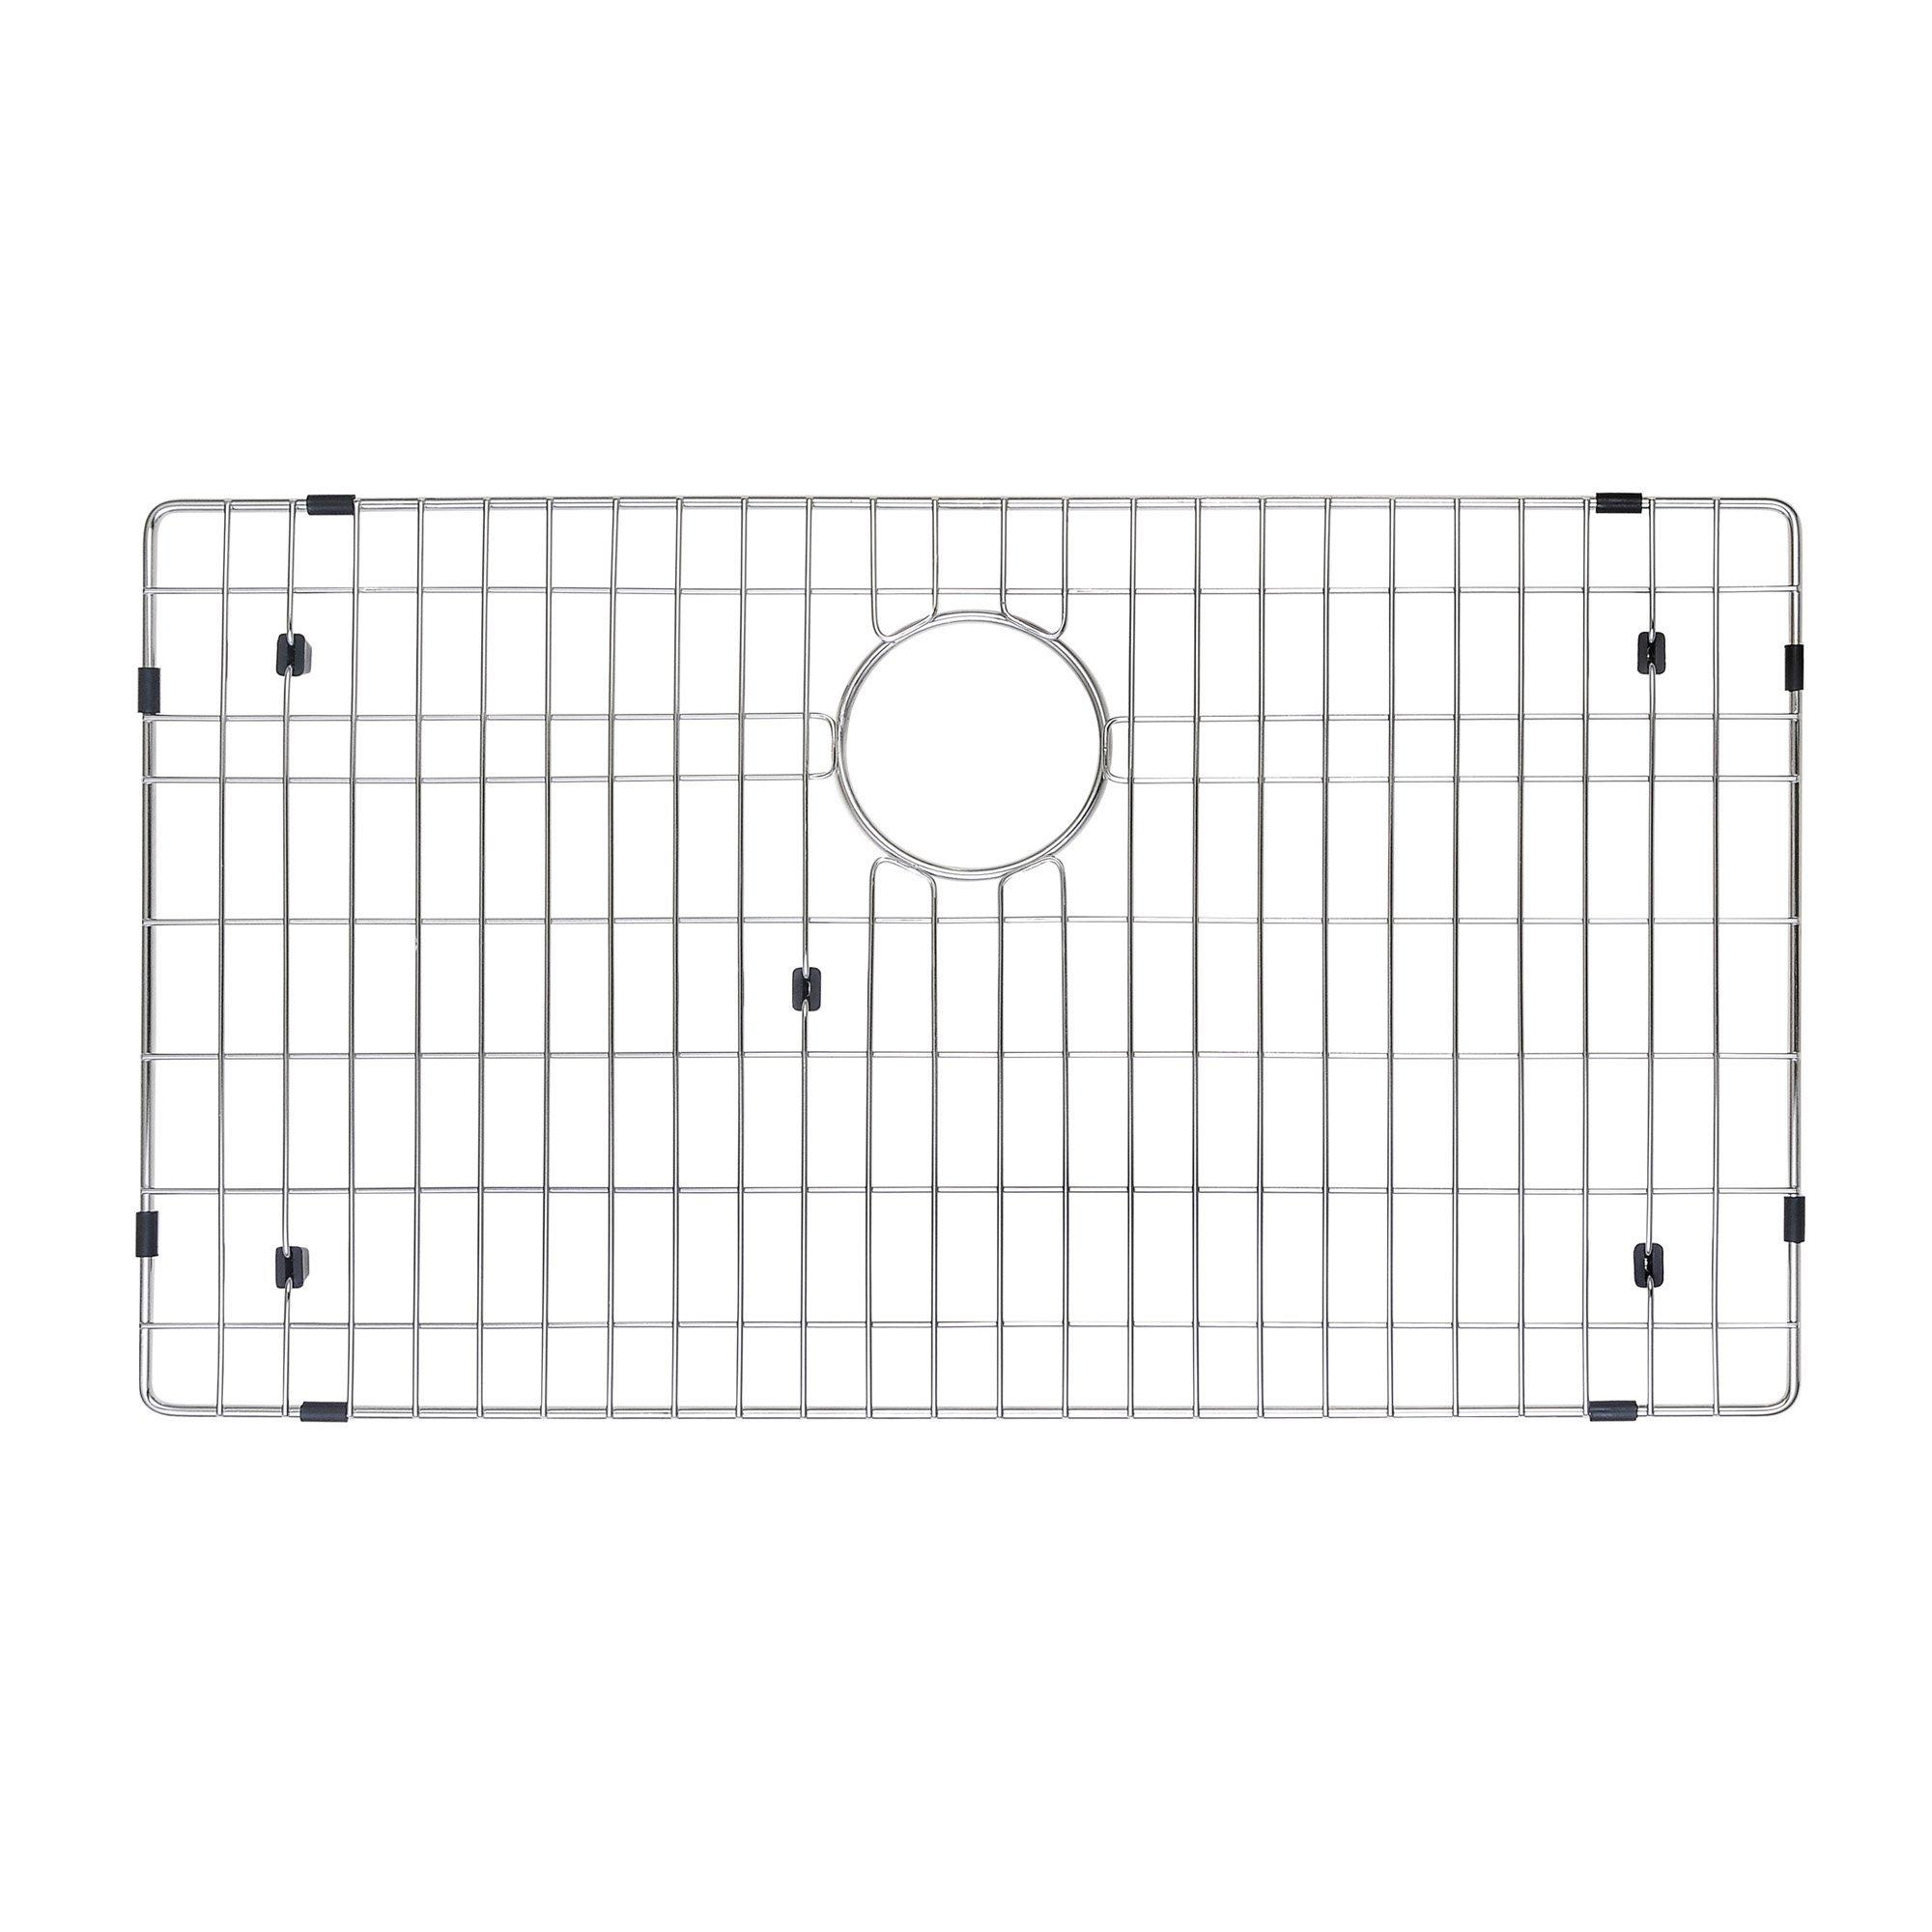 Kraus KEA-14445BN Aura Bathroom Accessories - Shelf with Railing Brushed Nickel by Kraus (Image #8)